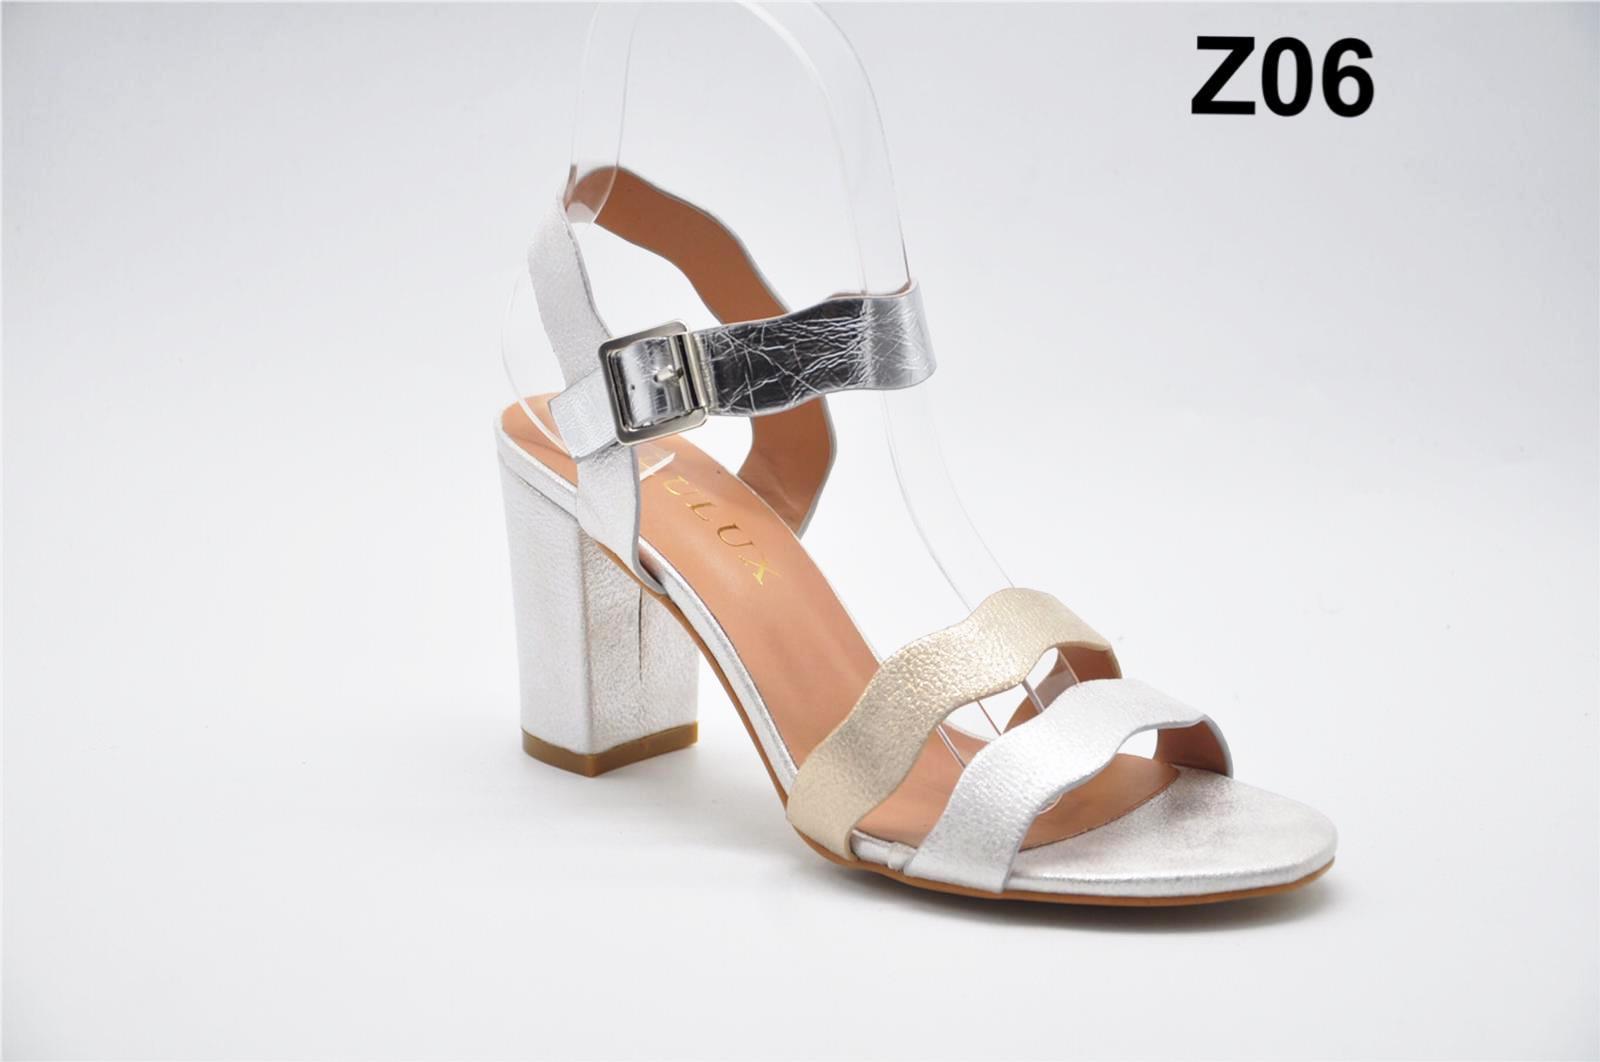 Sandale dama argintii Erika